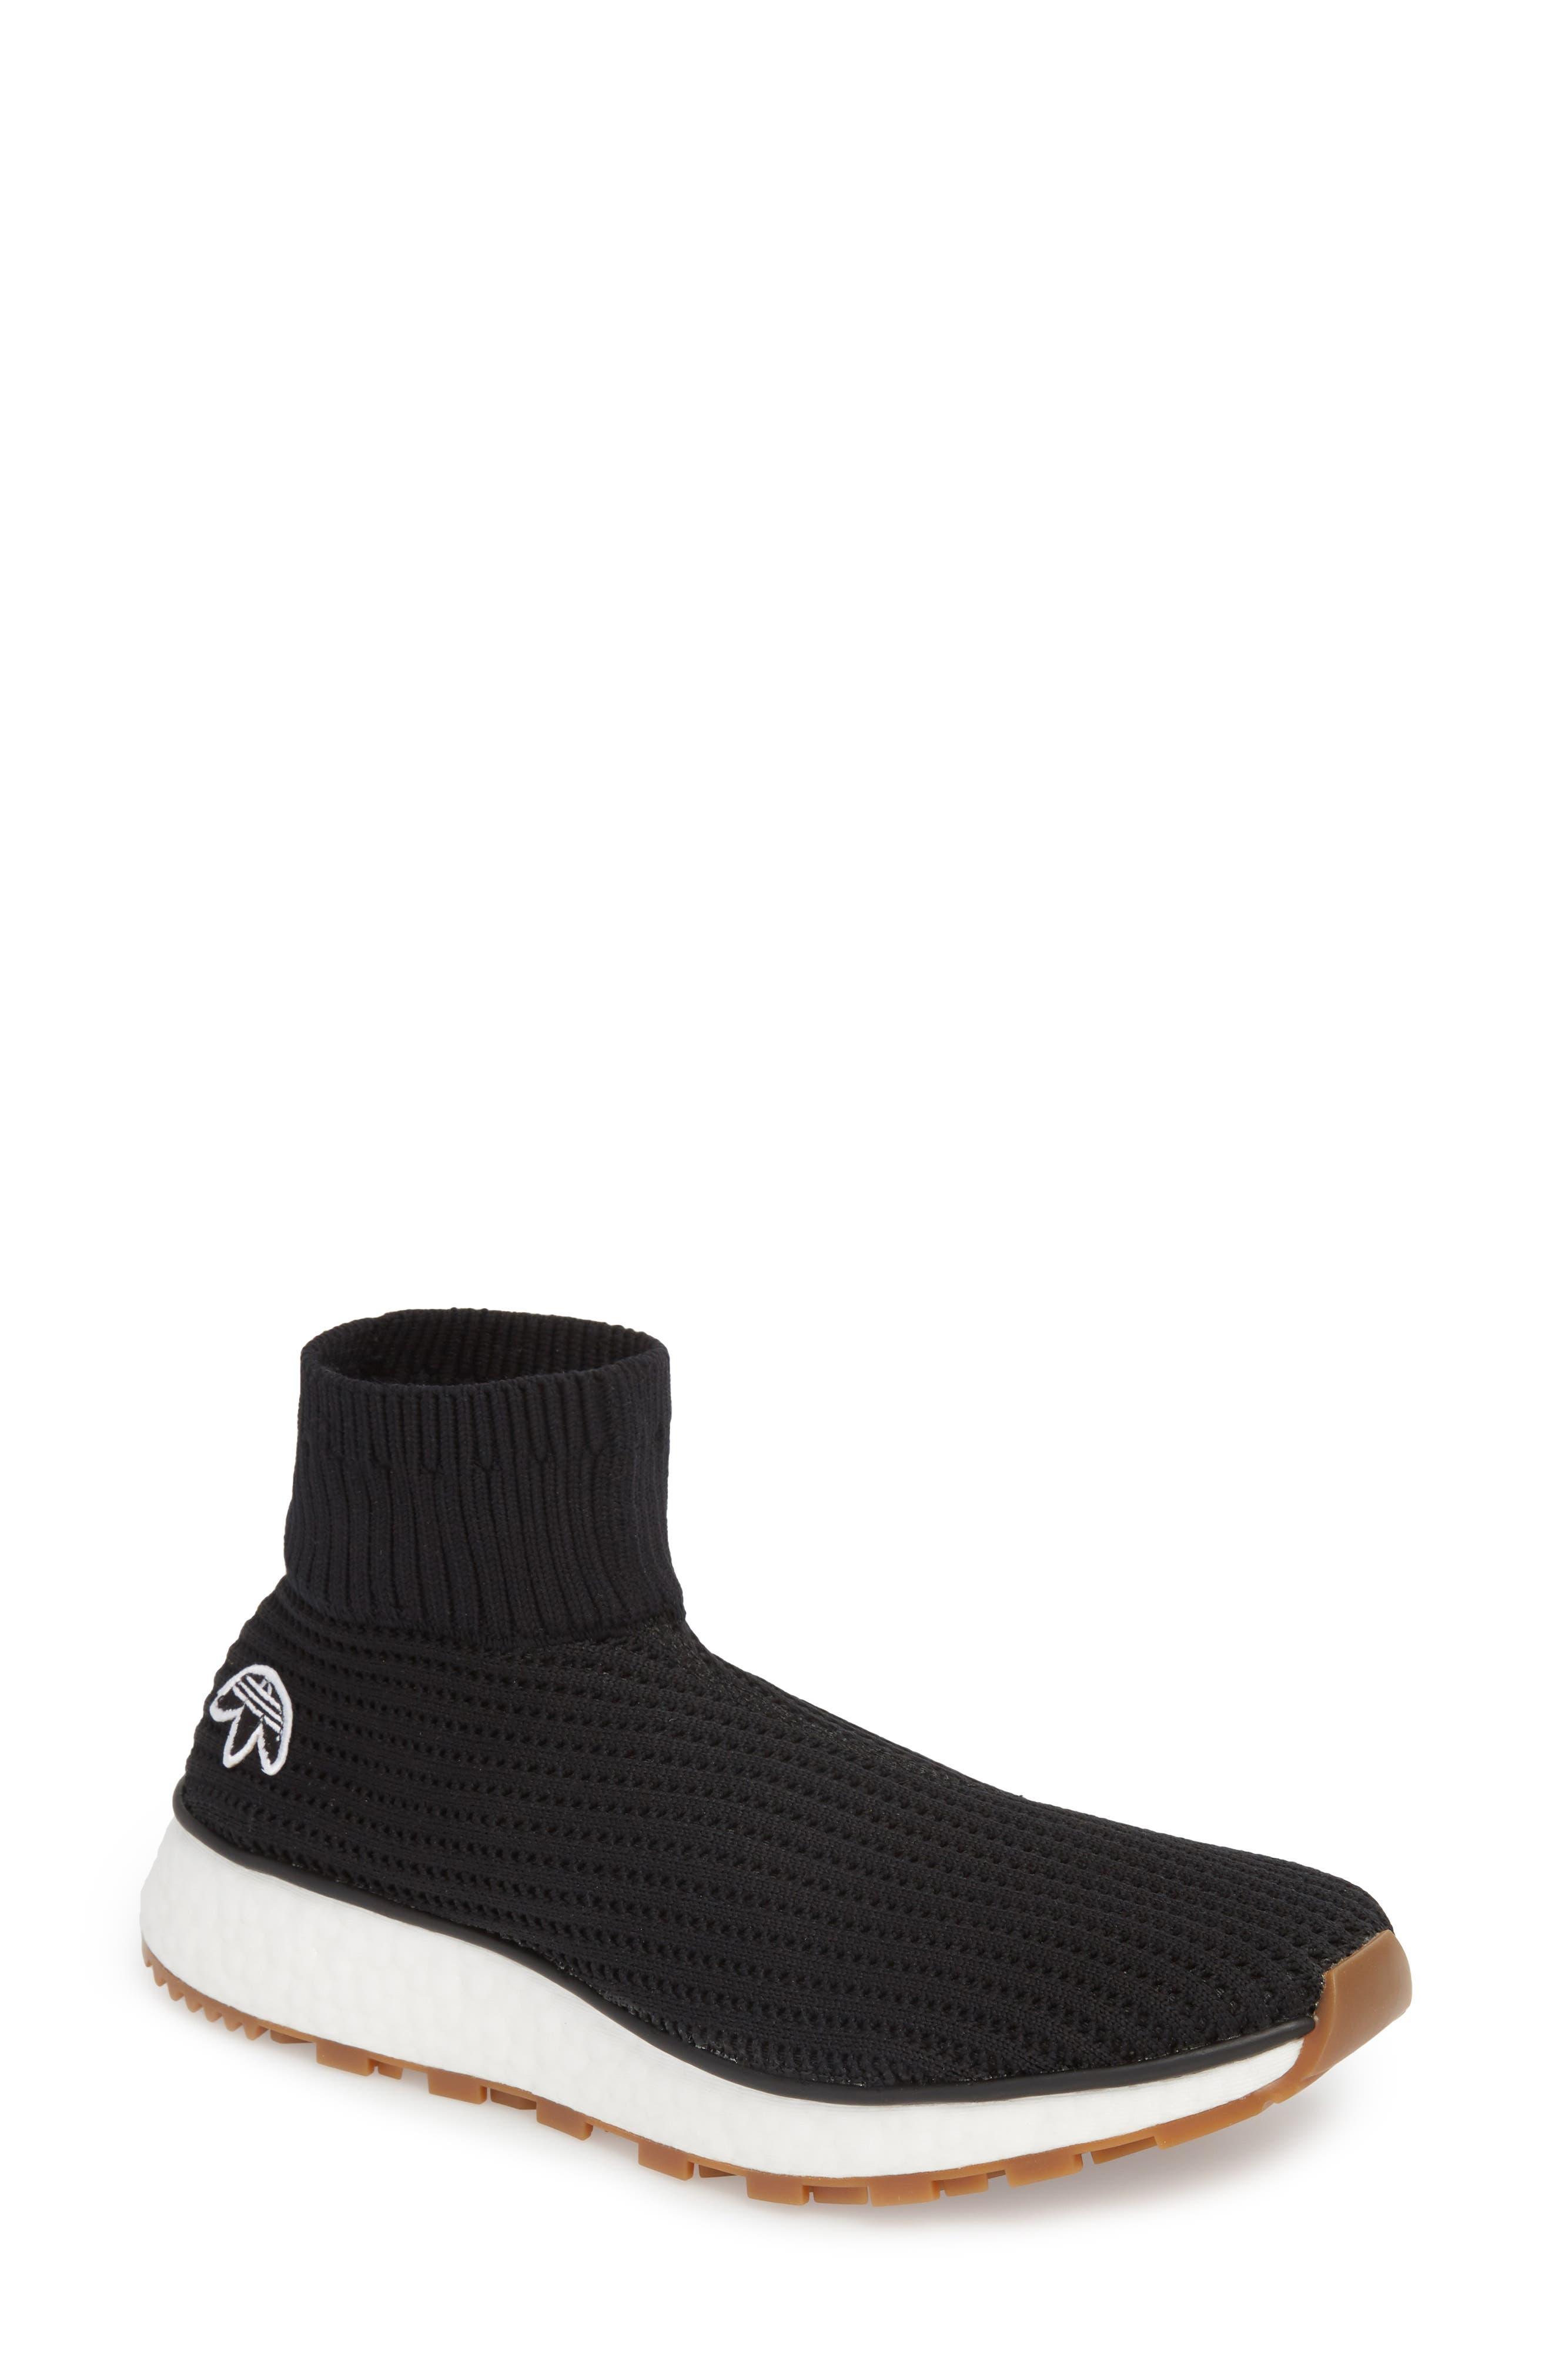 adidas sock sneakers